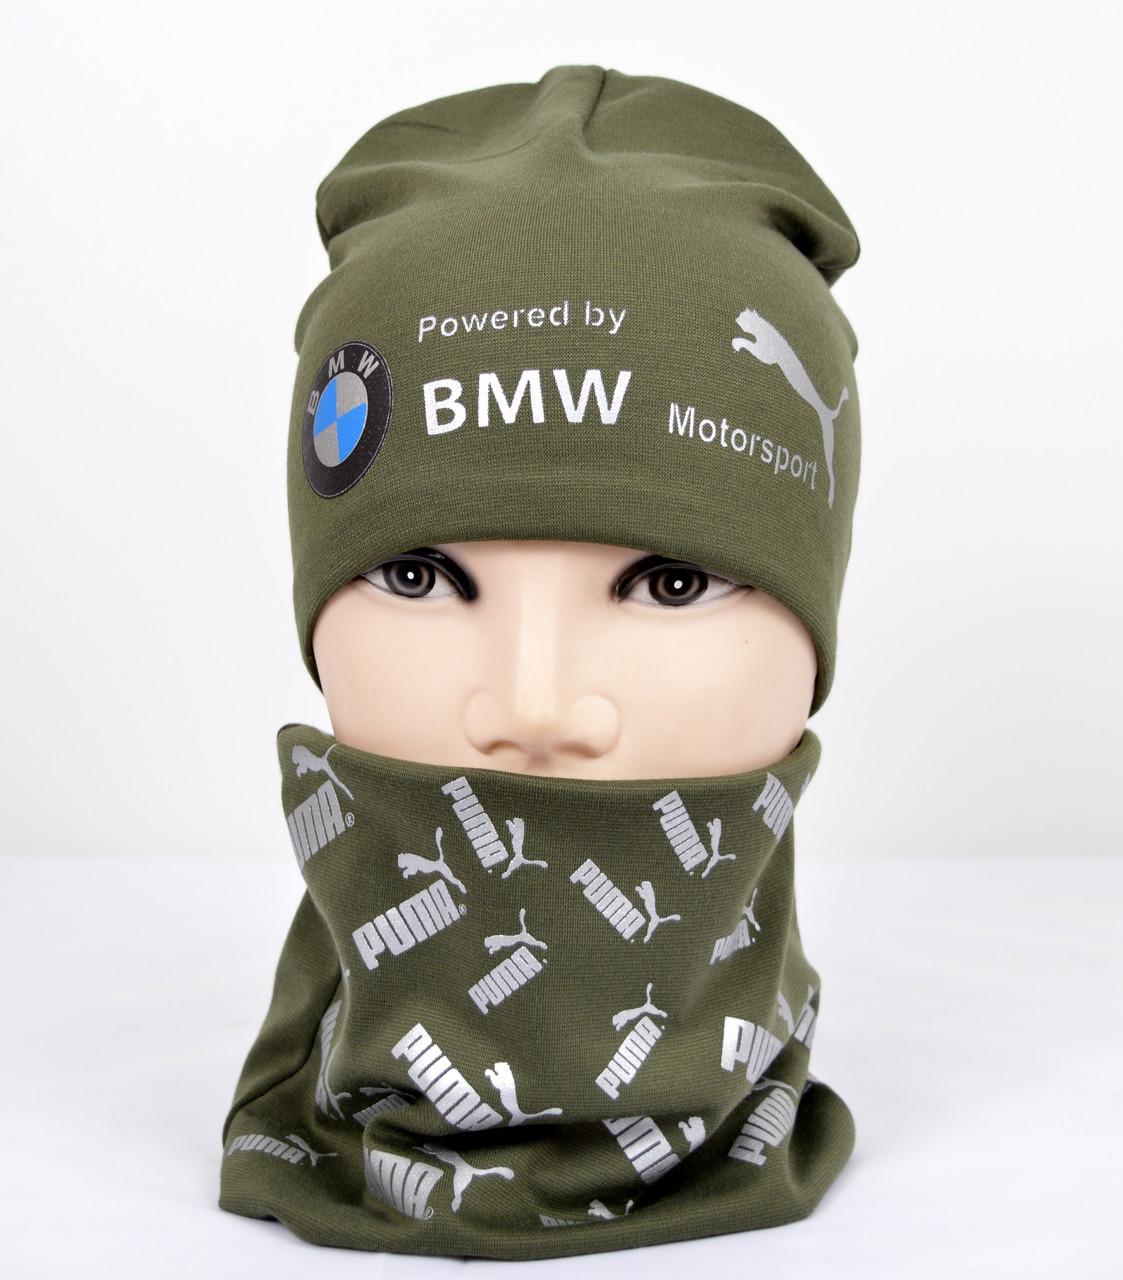 Трикотажный комплект Puma BMW (шапка+хомут) хаки+серебро